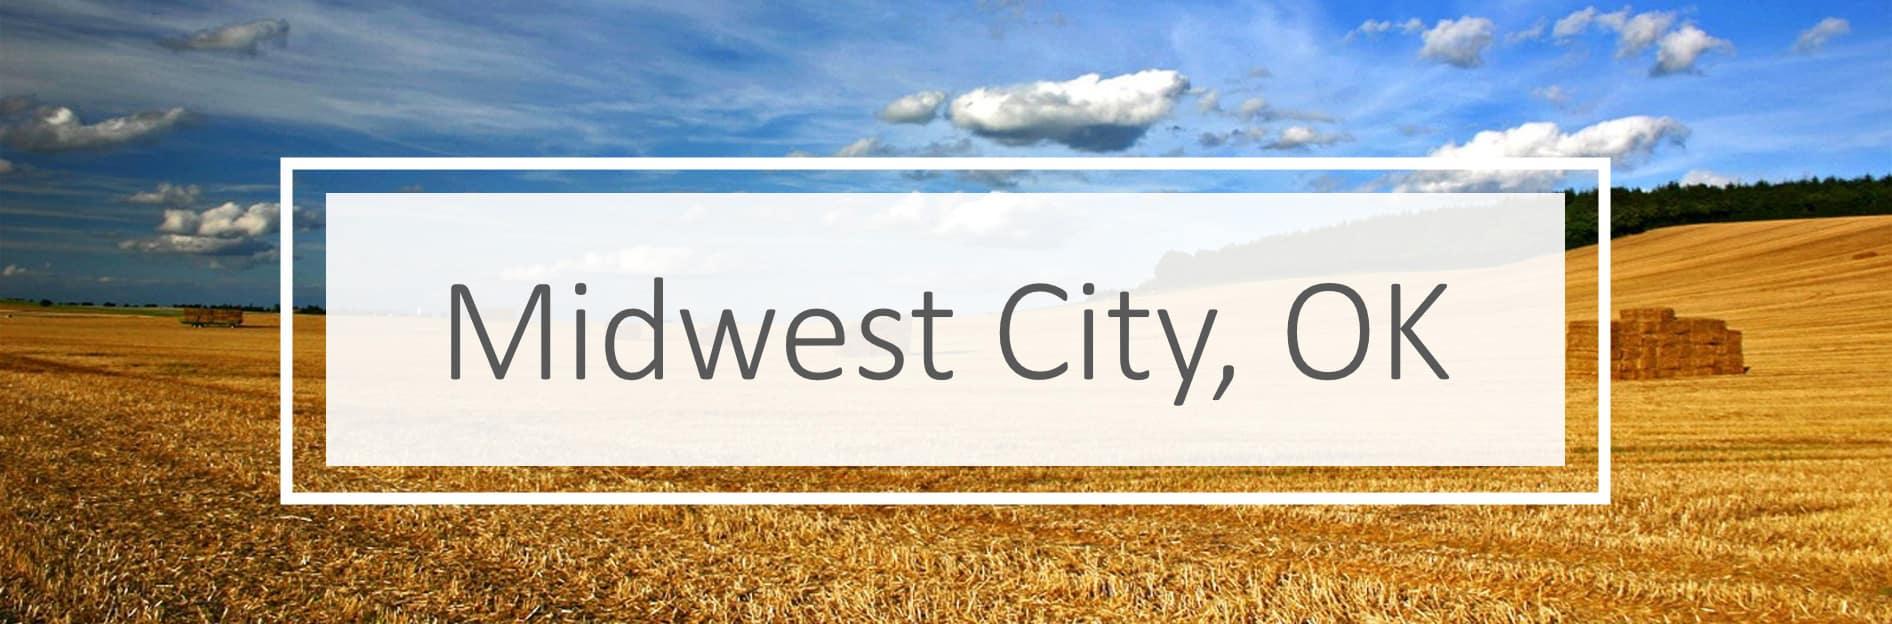 INFINITI Dealer Serving Midwest City, OK